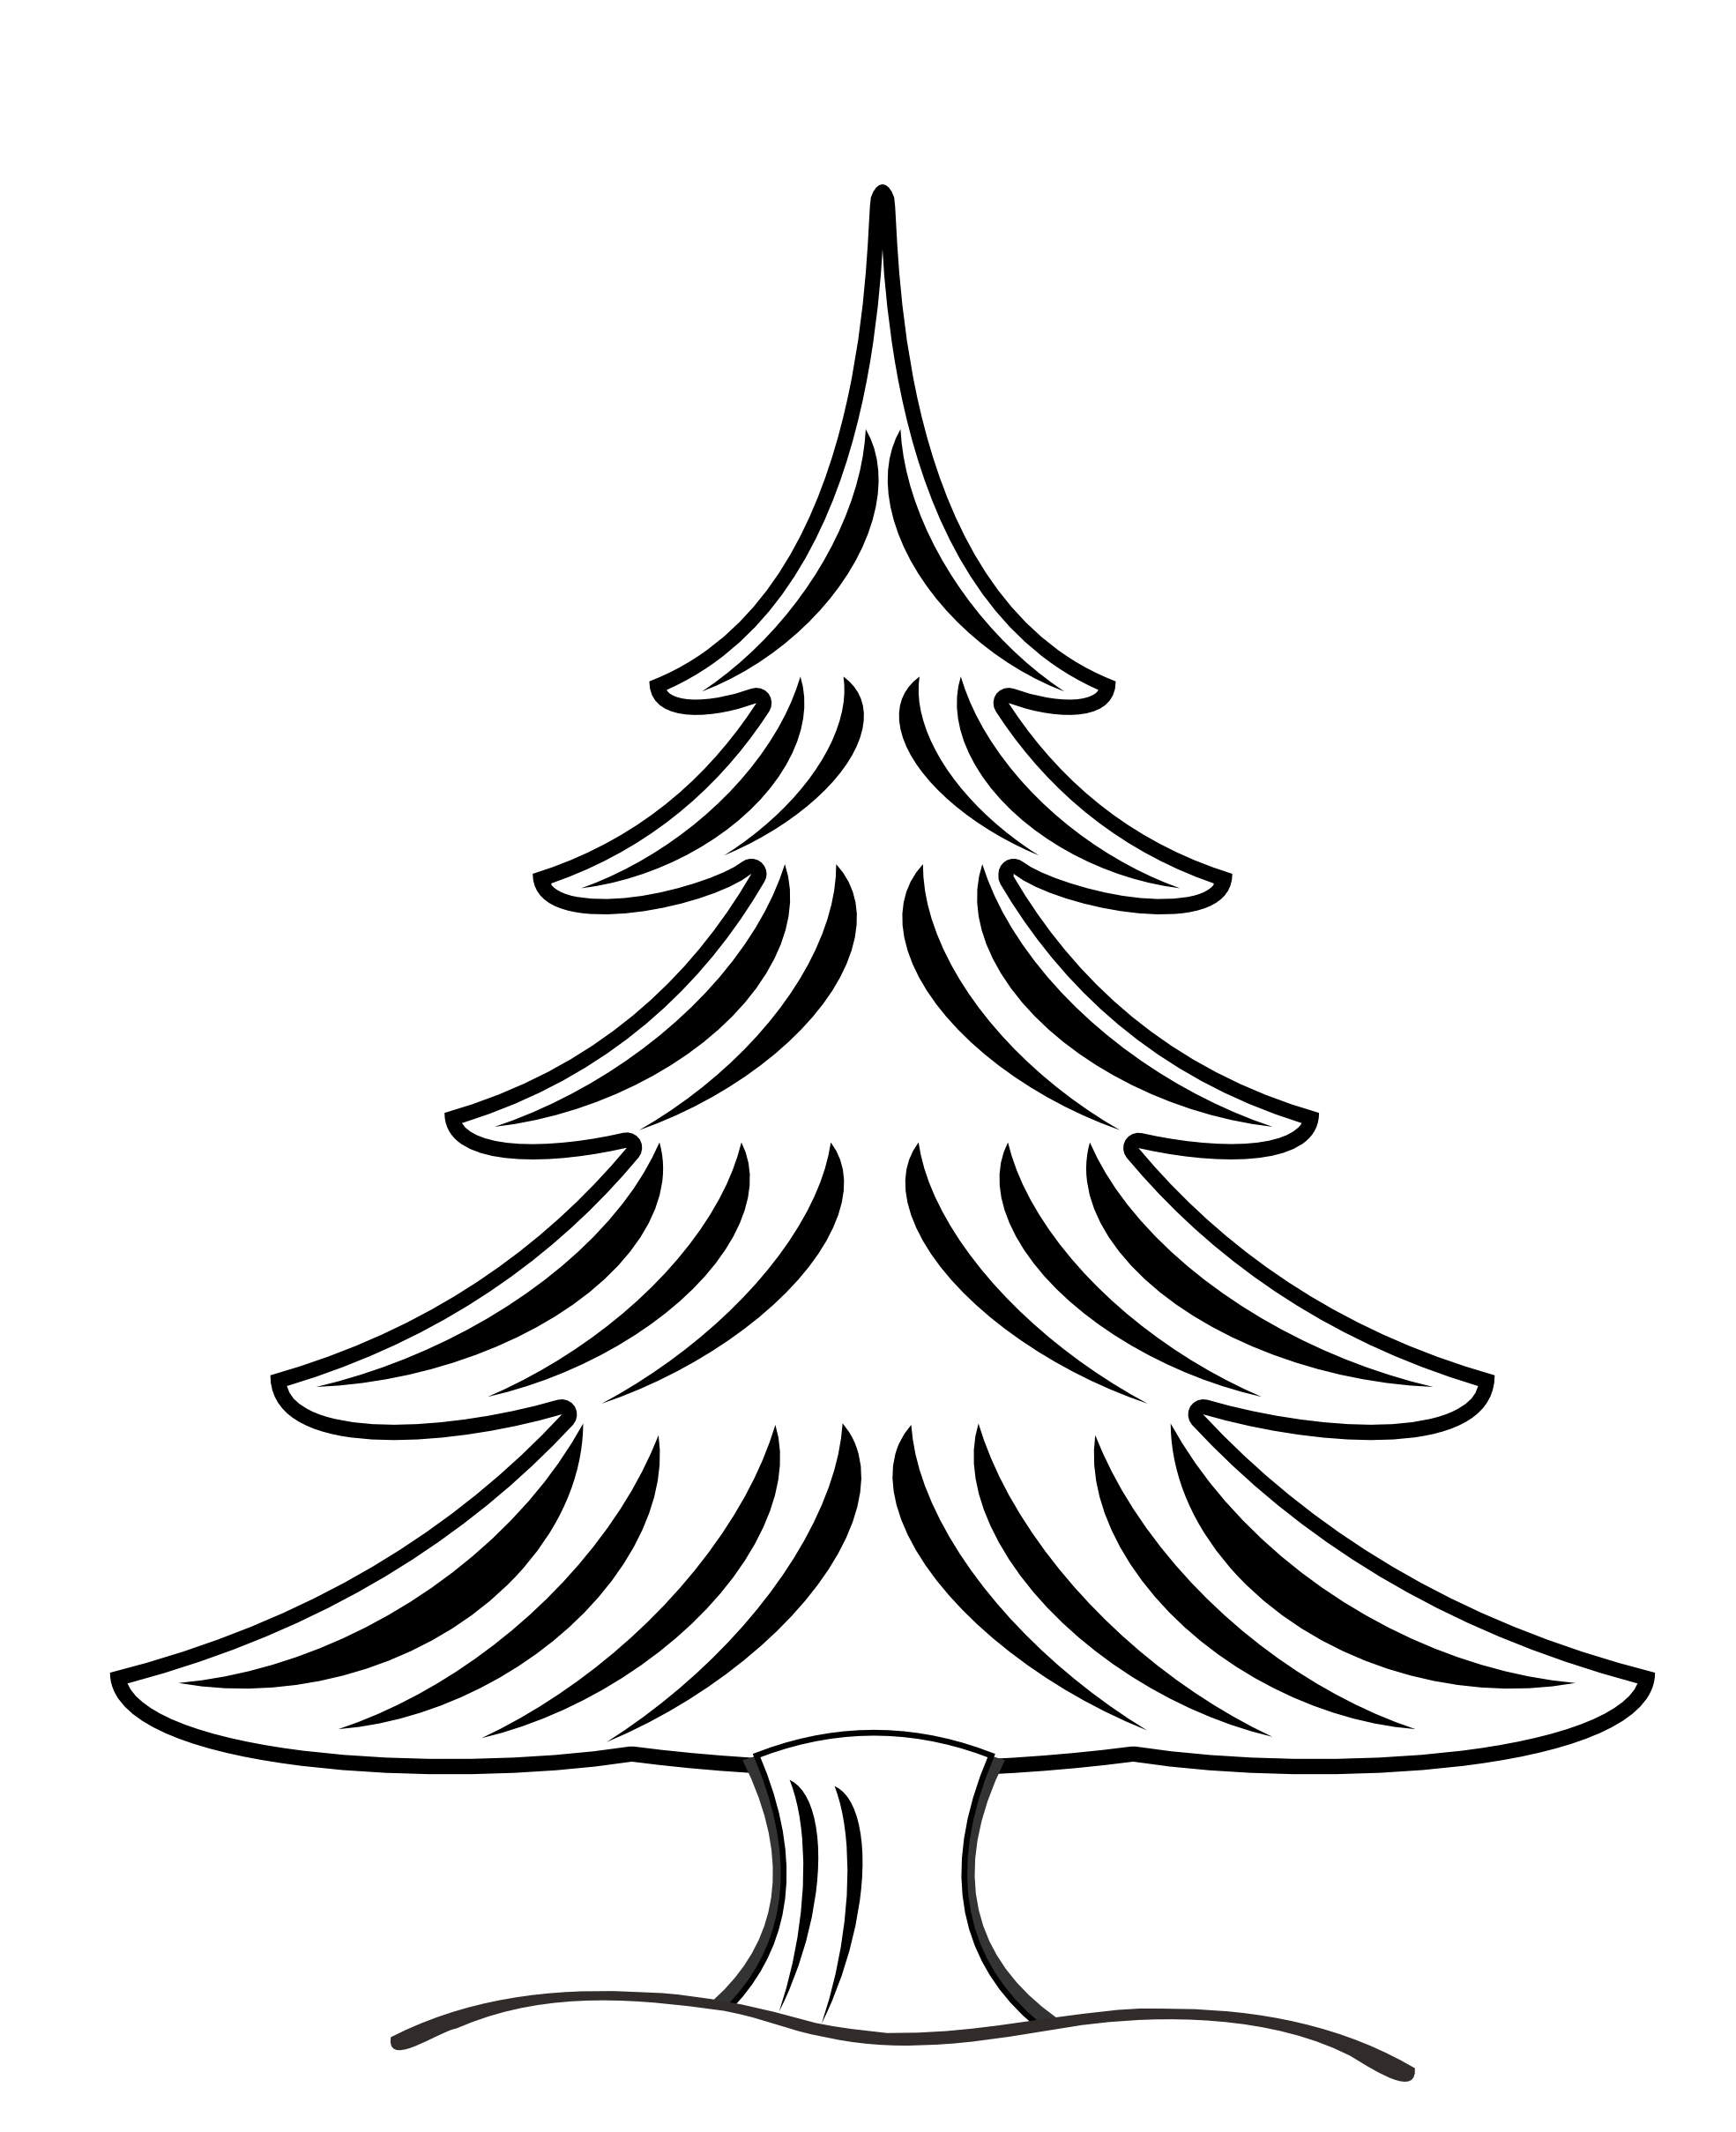 Black And White Christmas Tree Clip Art free image.